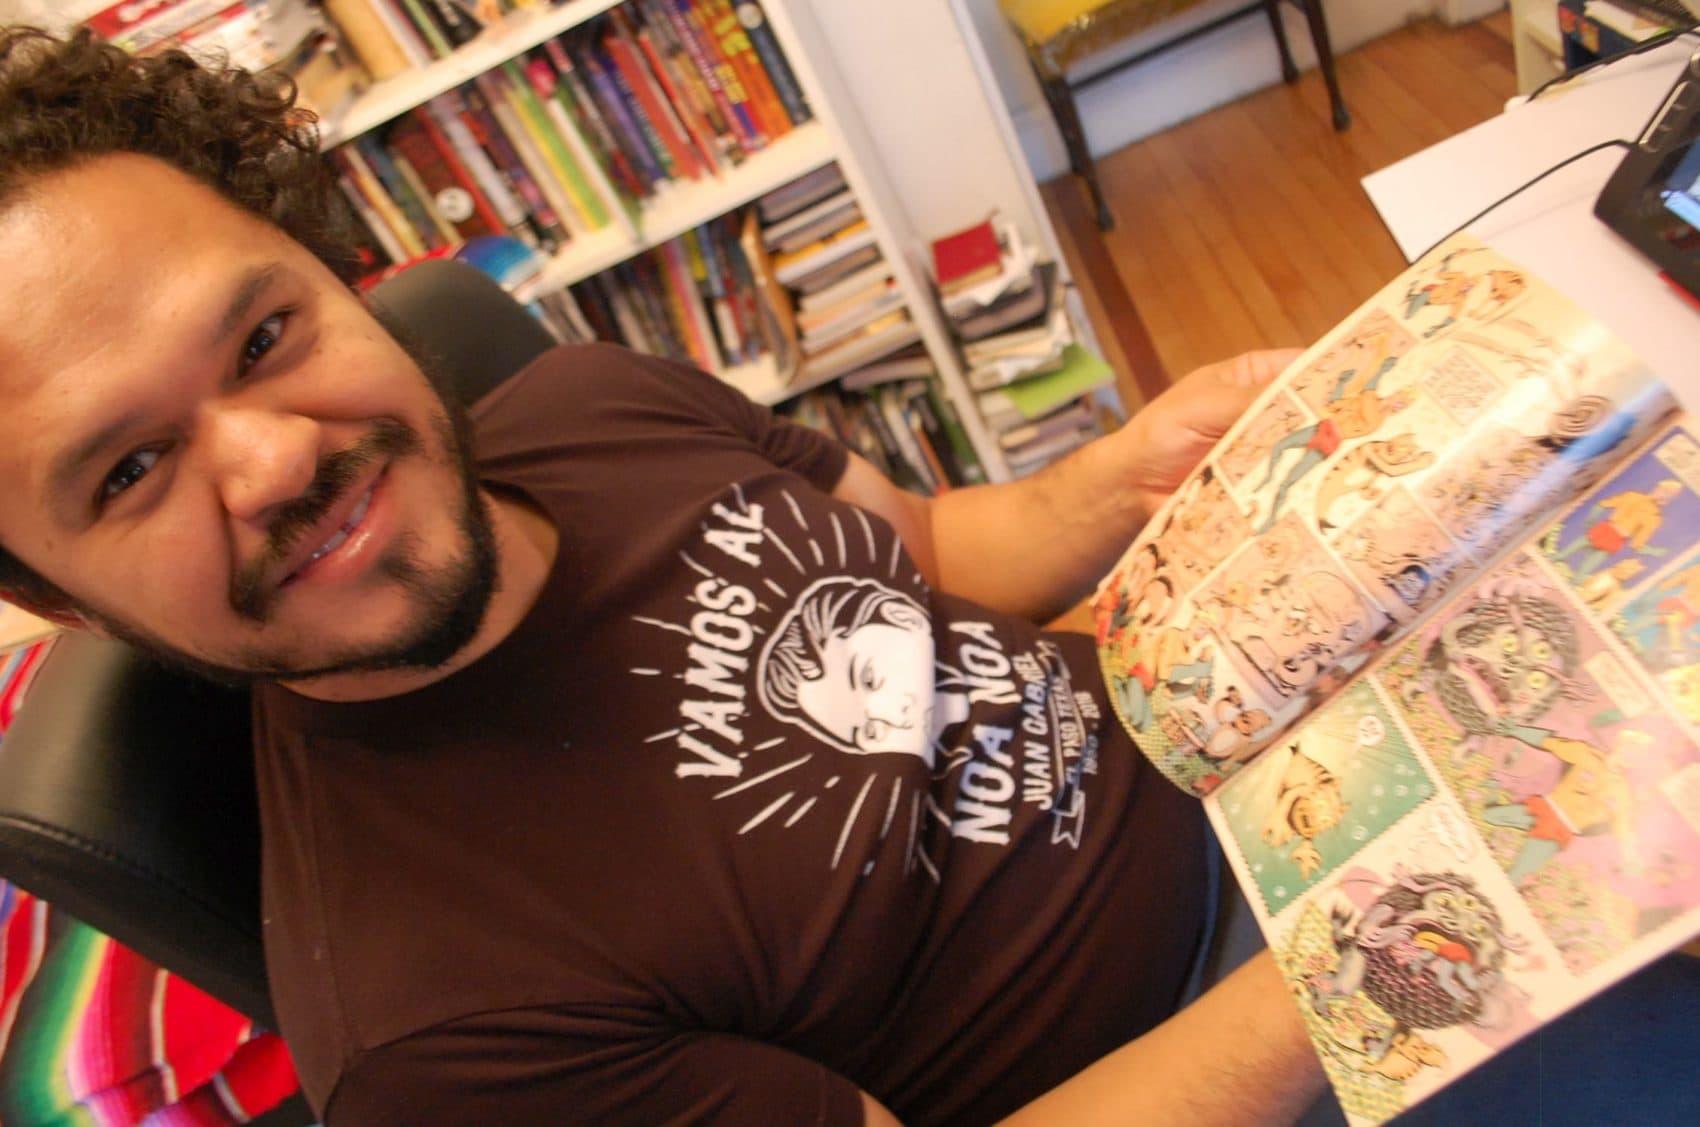 Raul Gonzalez shows off his work on the SpongeBob comic book (Dana Forsythe for WBUR)